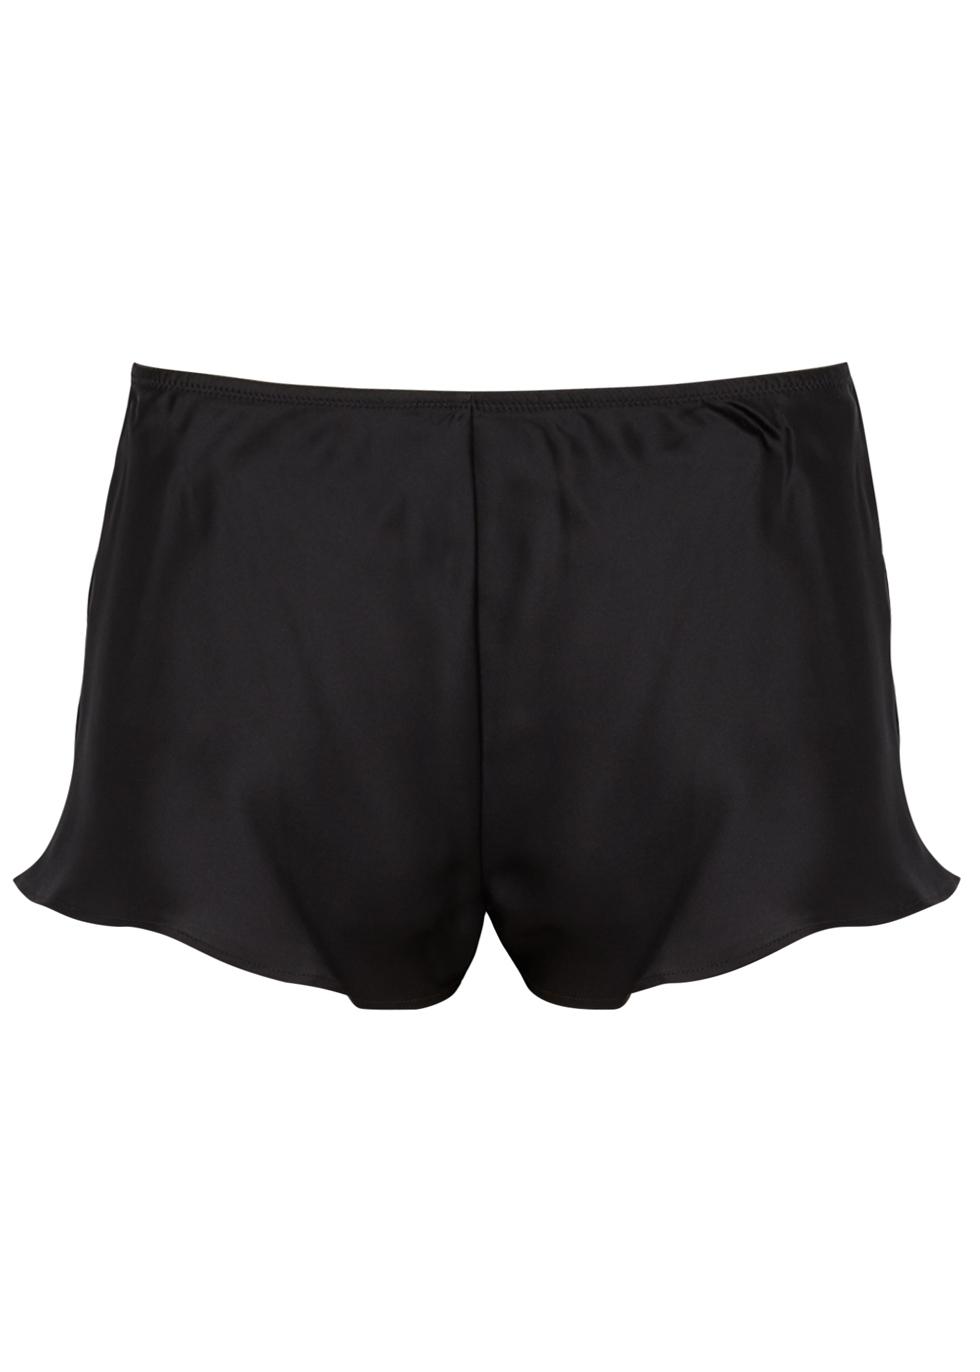 Dream Black Silk Shorts